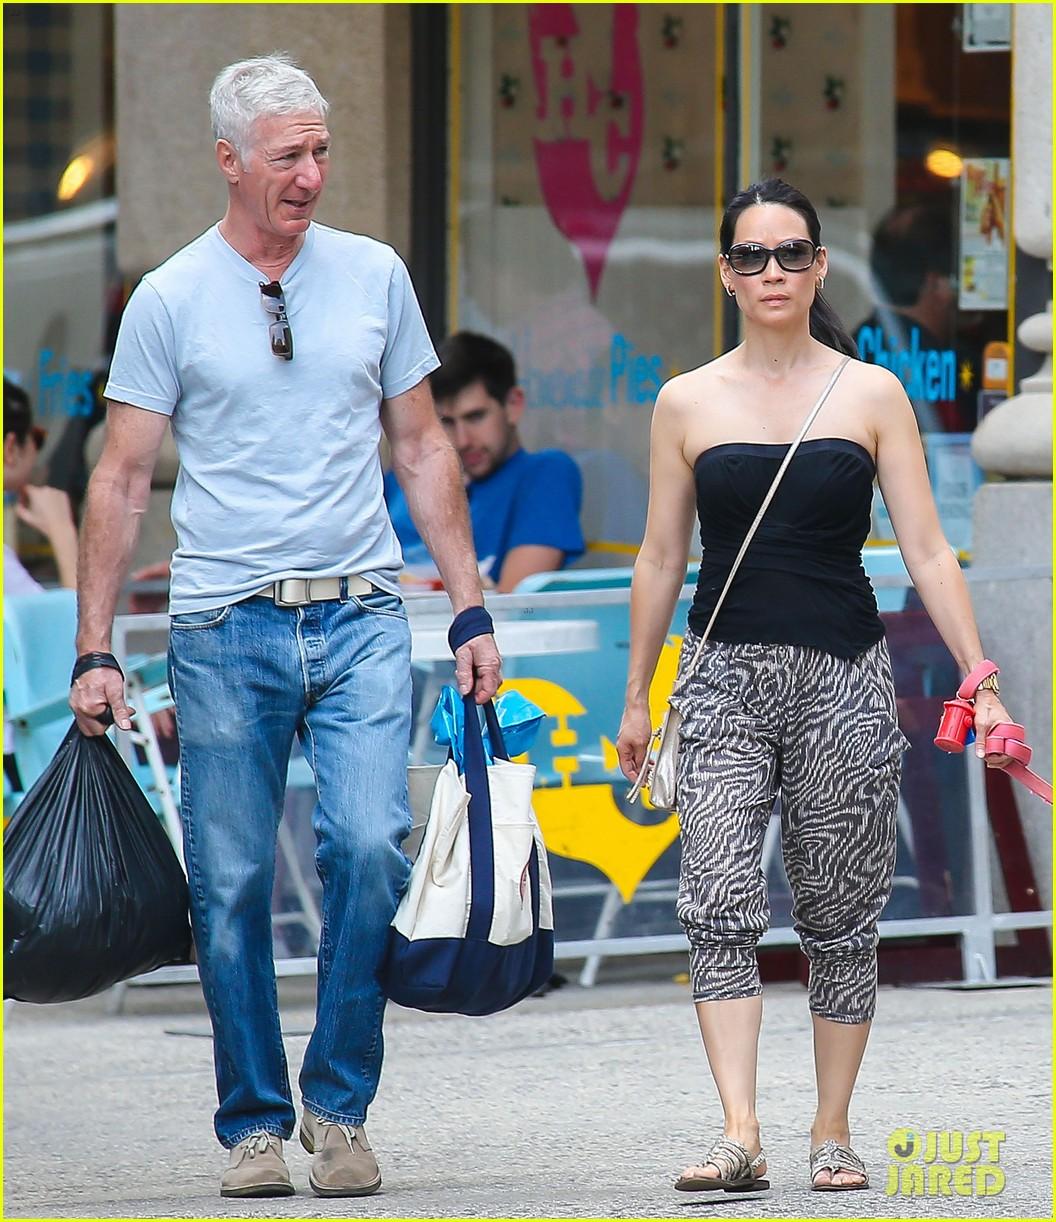 lucy liu new boyfriend hold hands in new york city 032932373